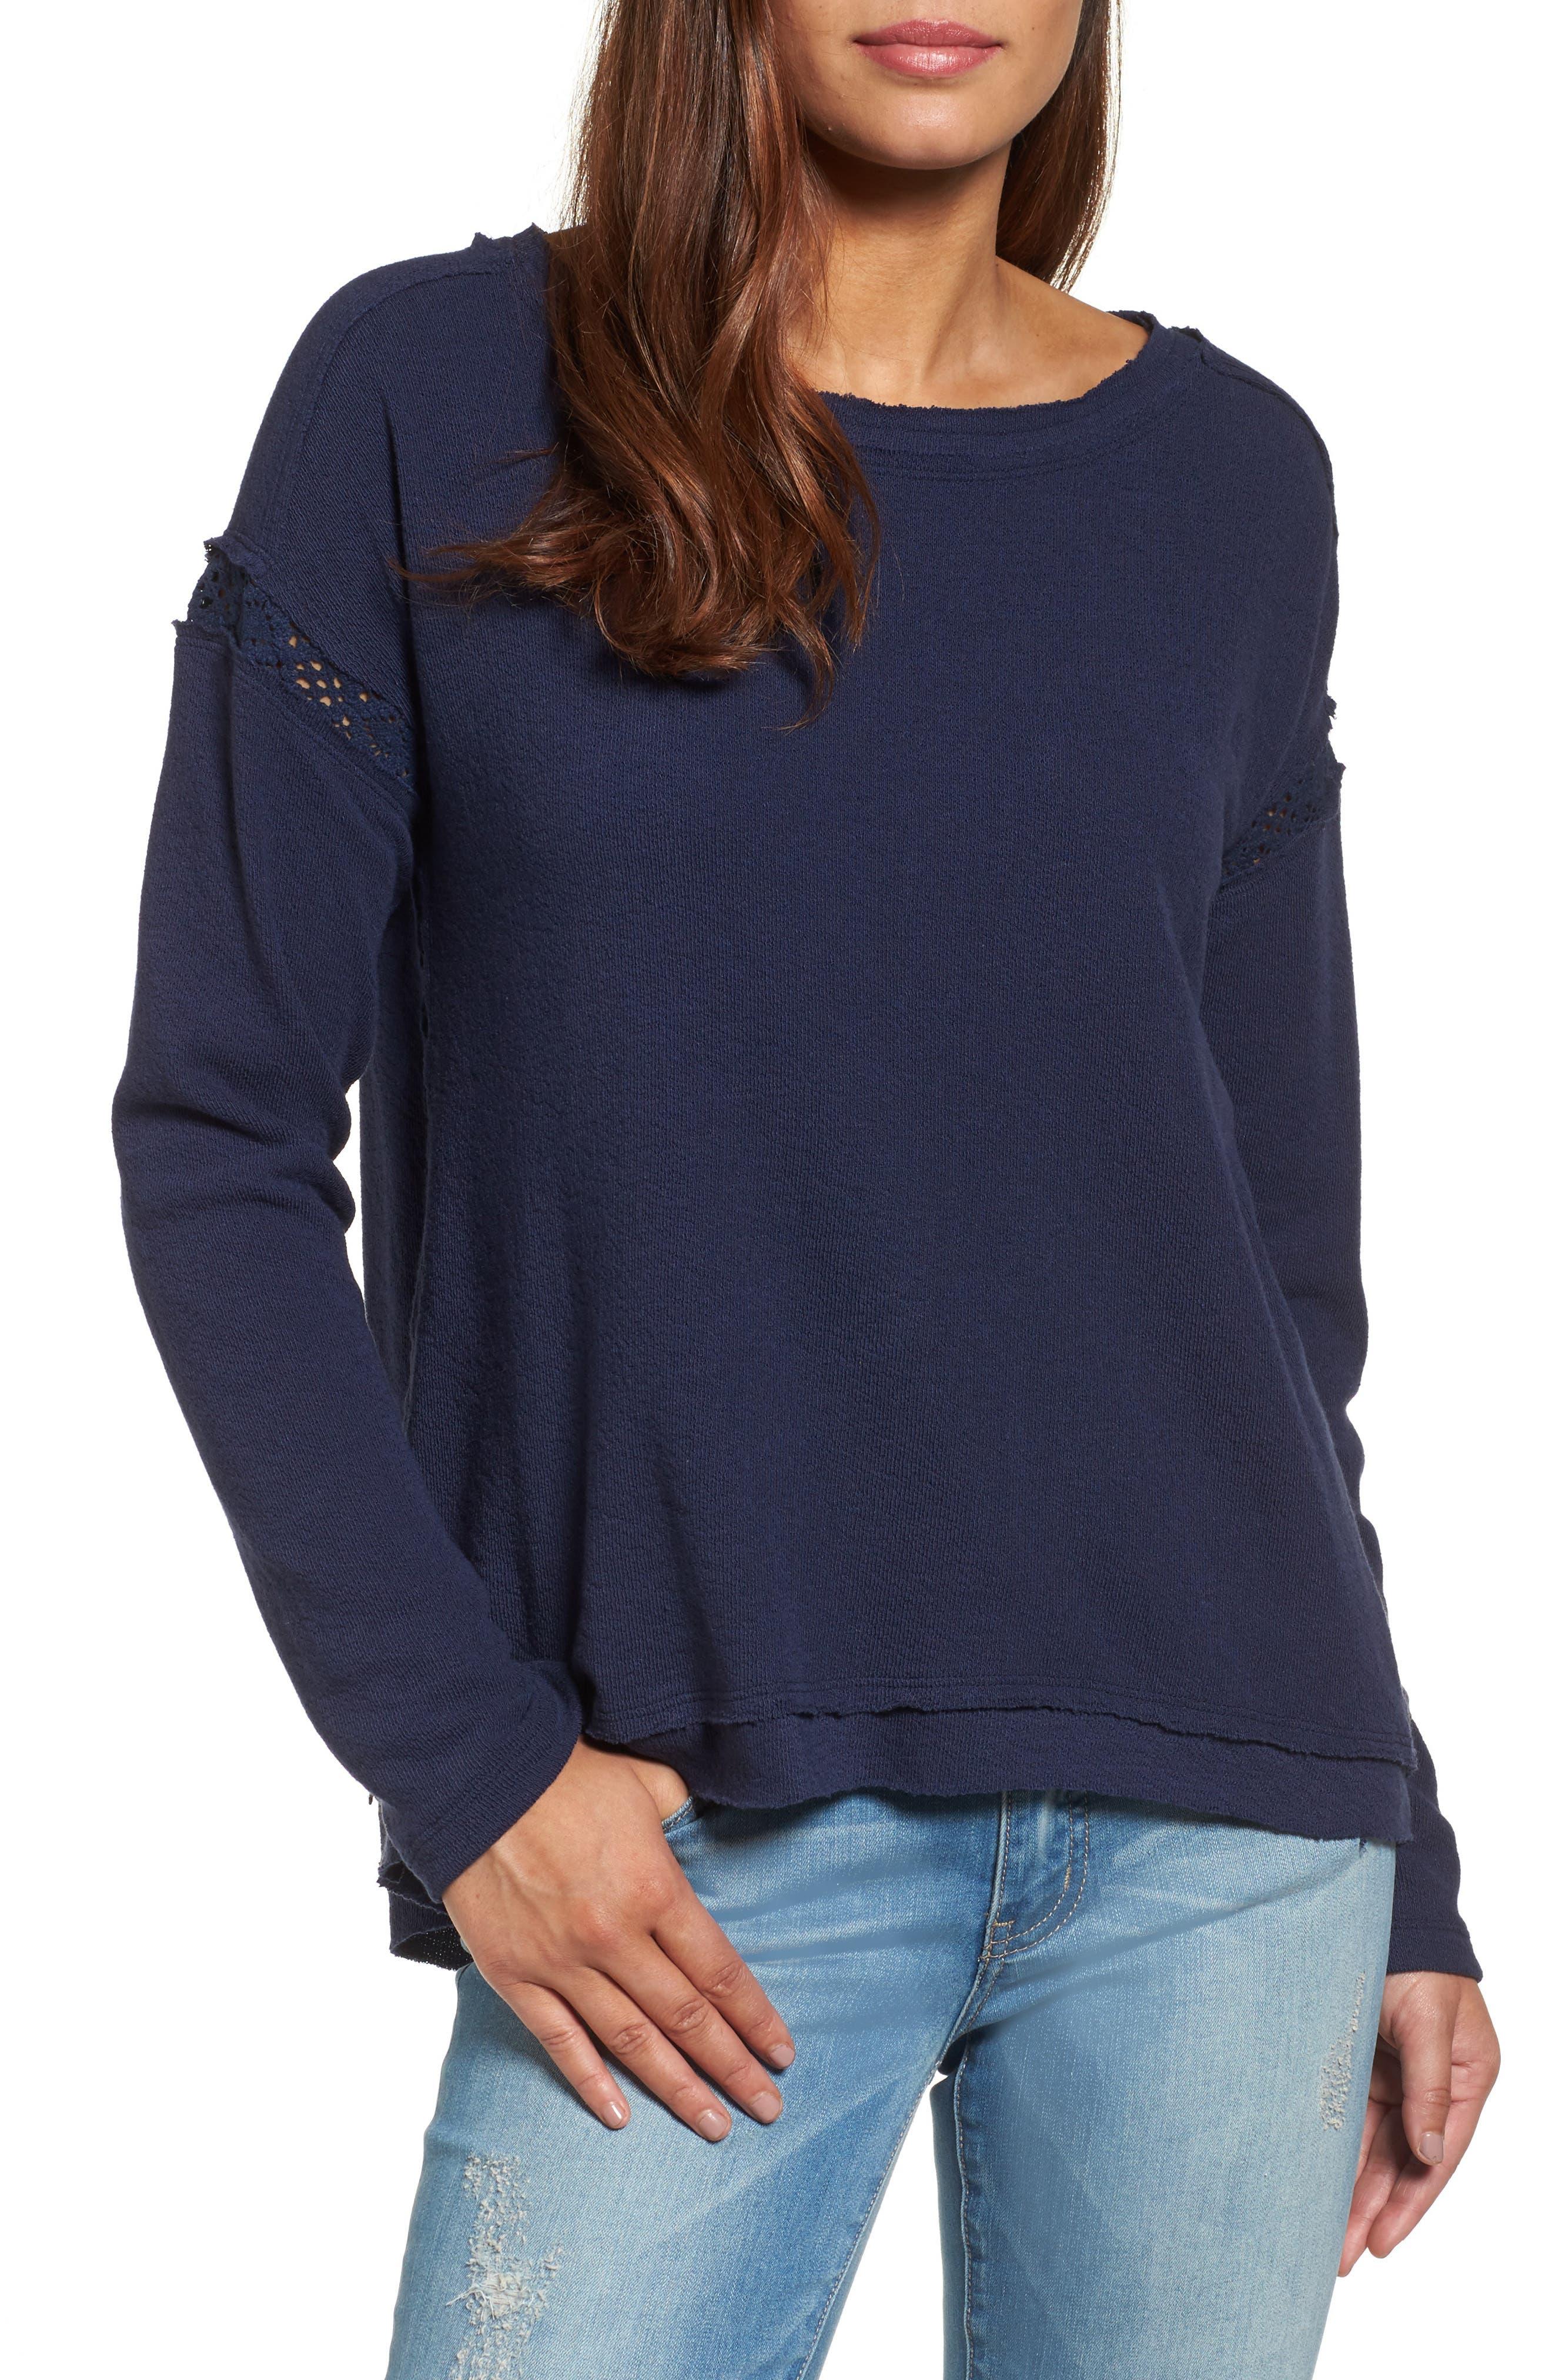 Crochet Lace Trim Sweatshirt,                             Main thumbnail 1, color,                             Navy Peacoat